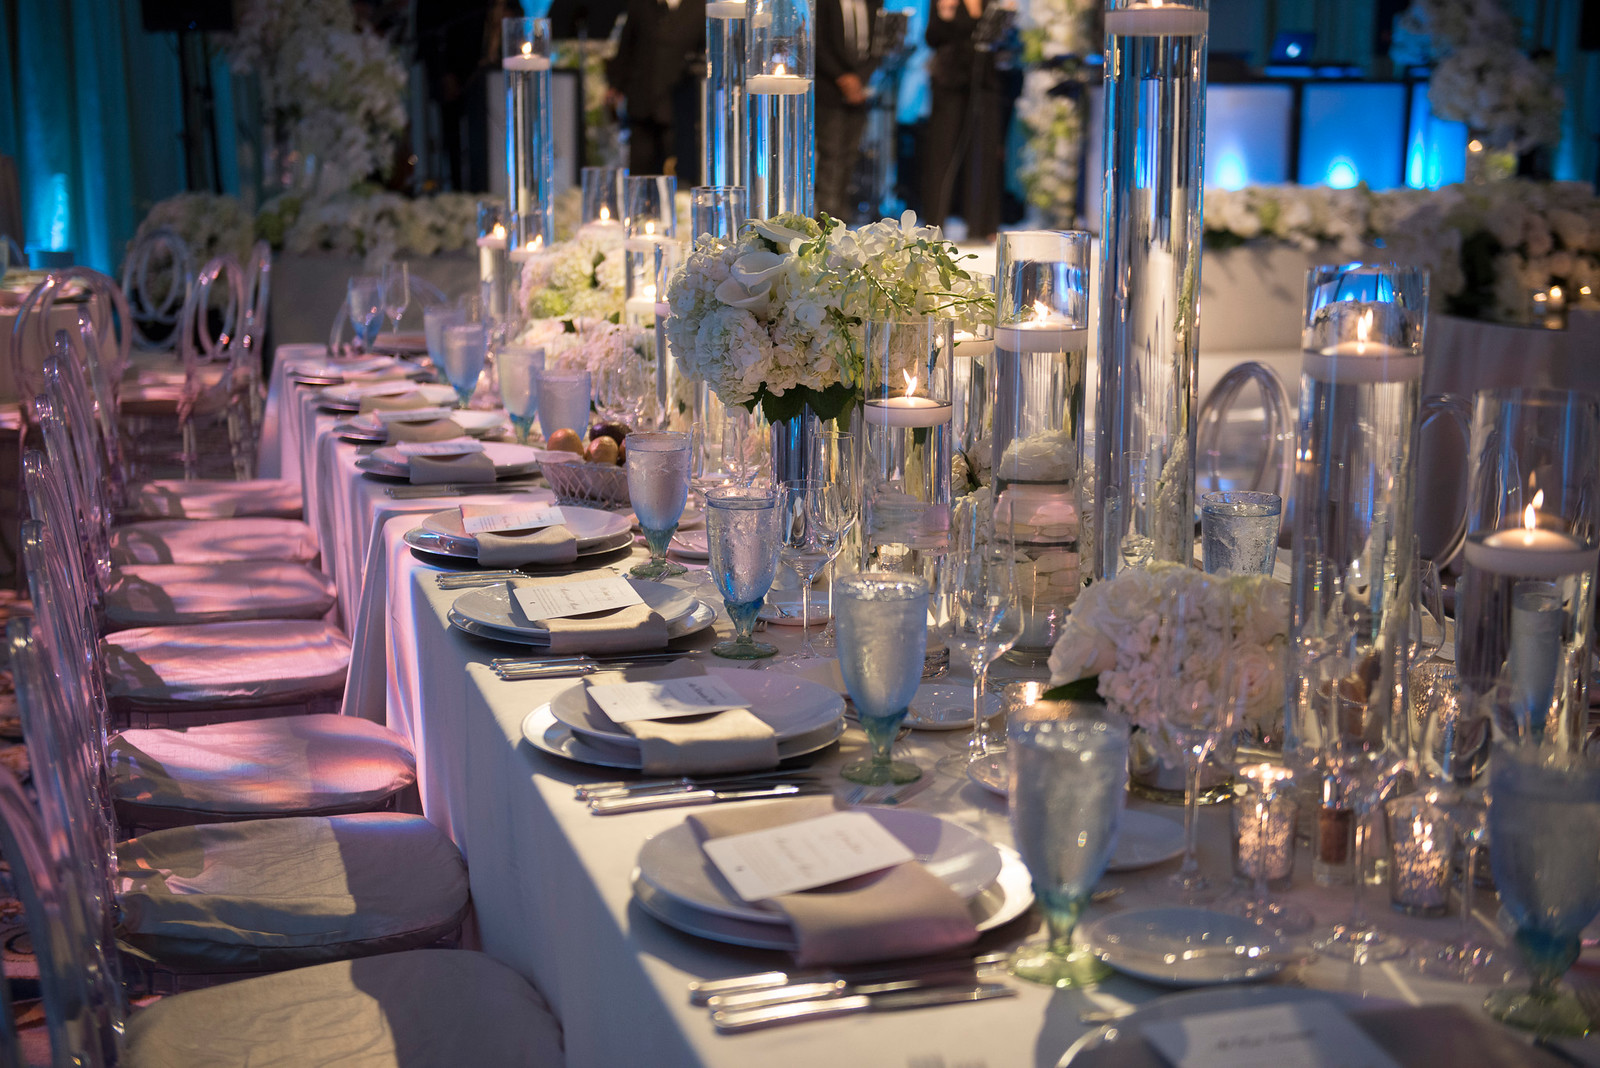 Lighting Design For Weddings & Events